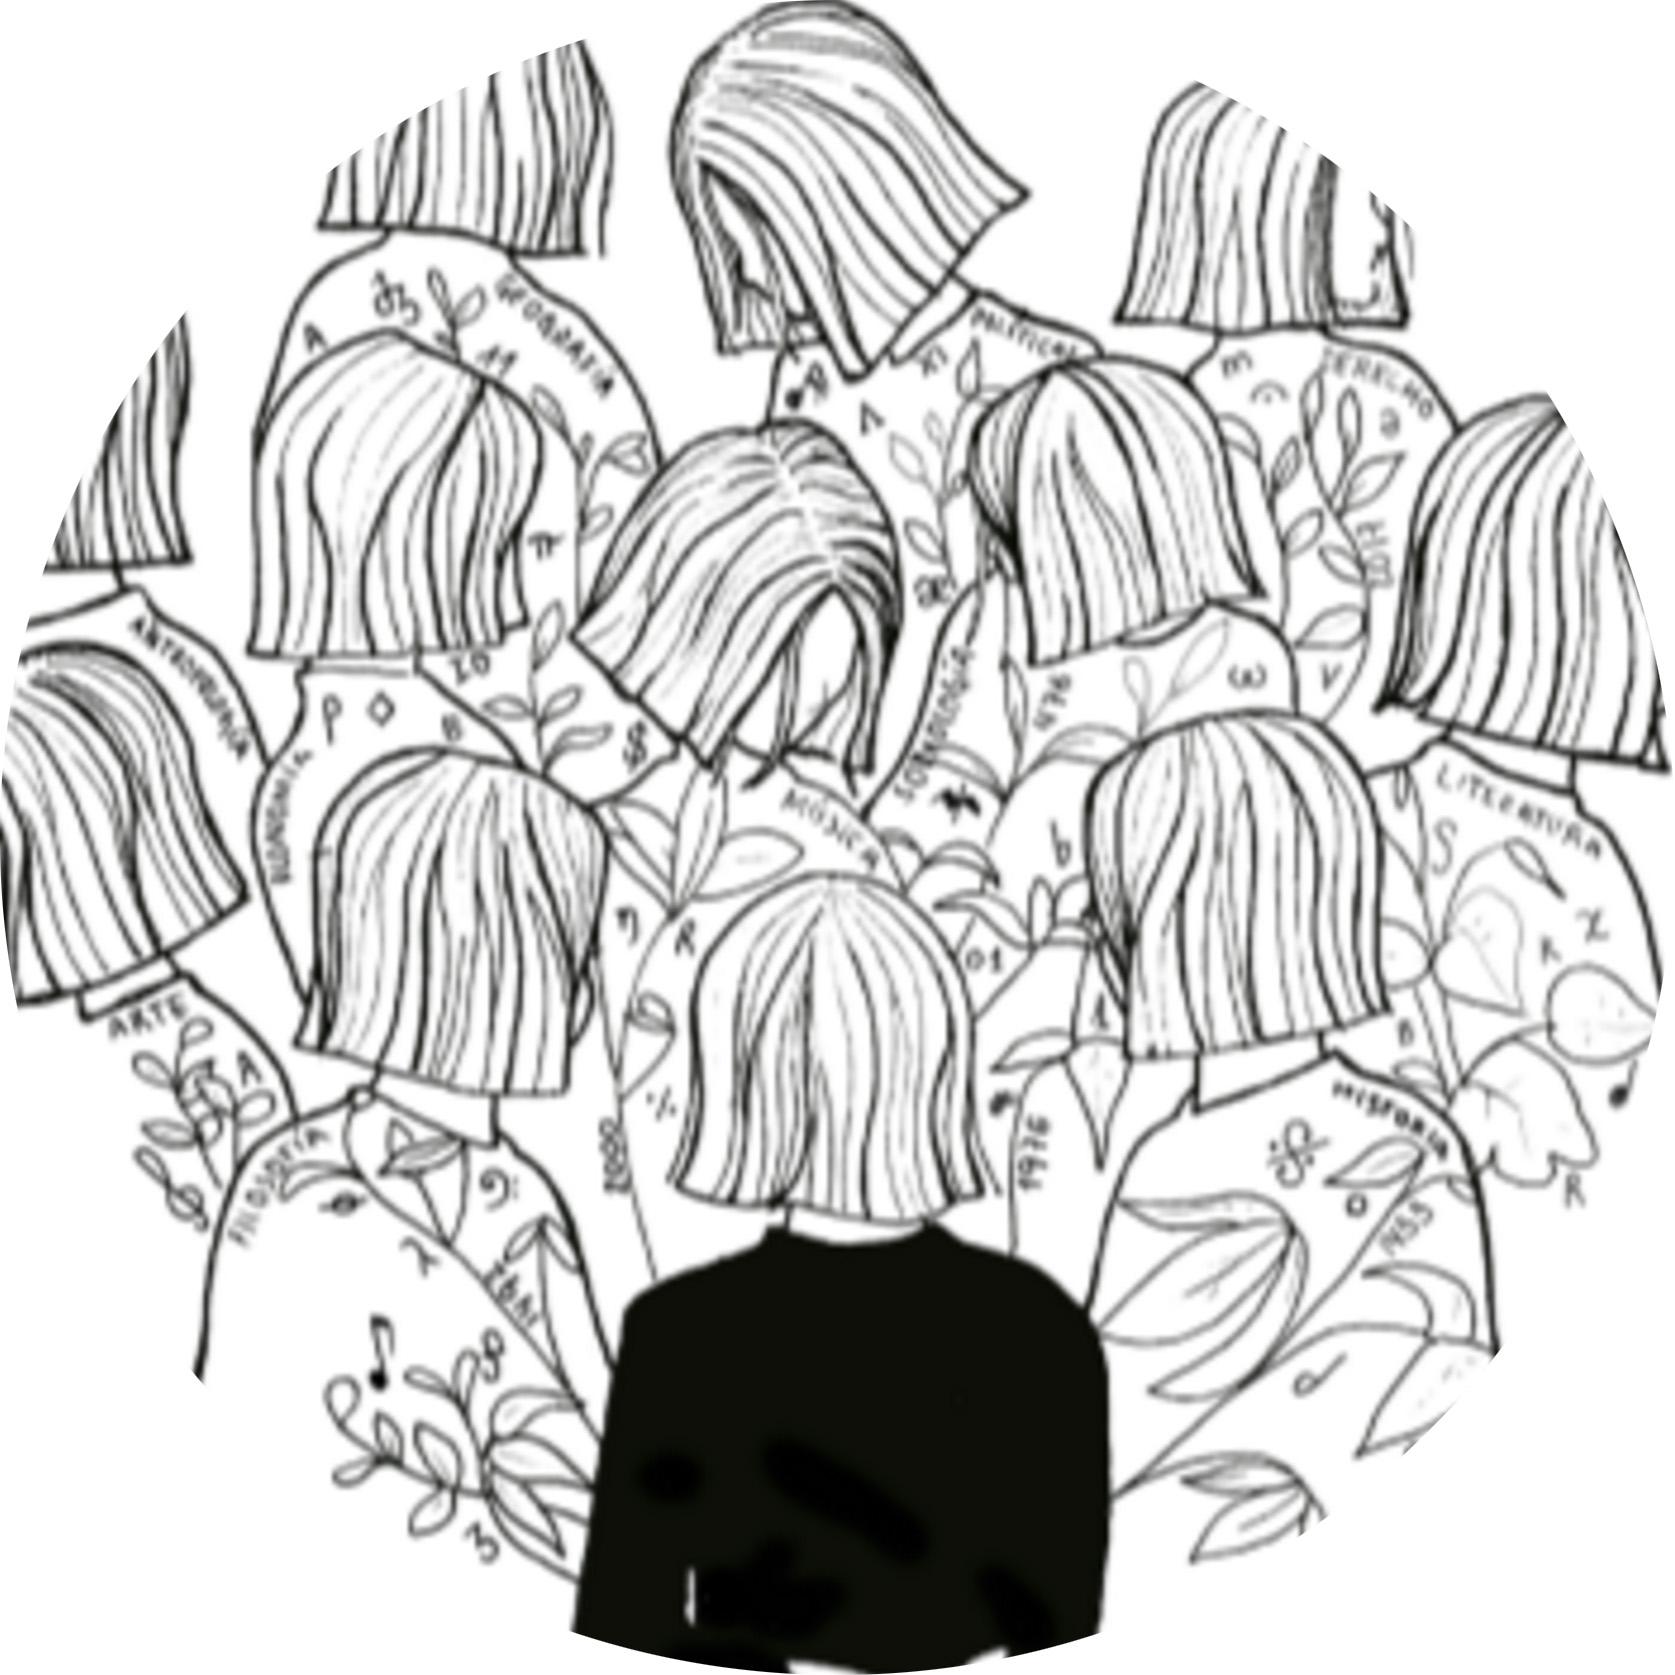 Ilustración: Alicia Posada (POAHdesing)